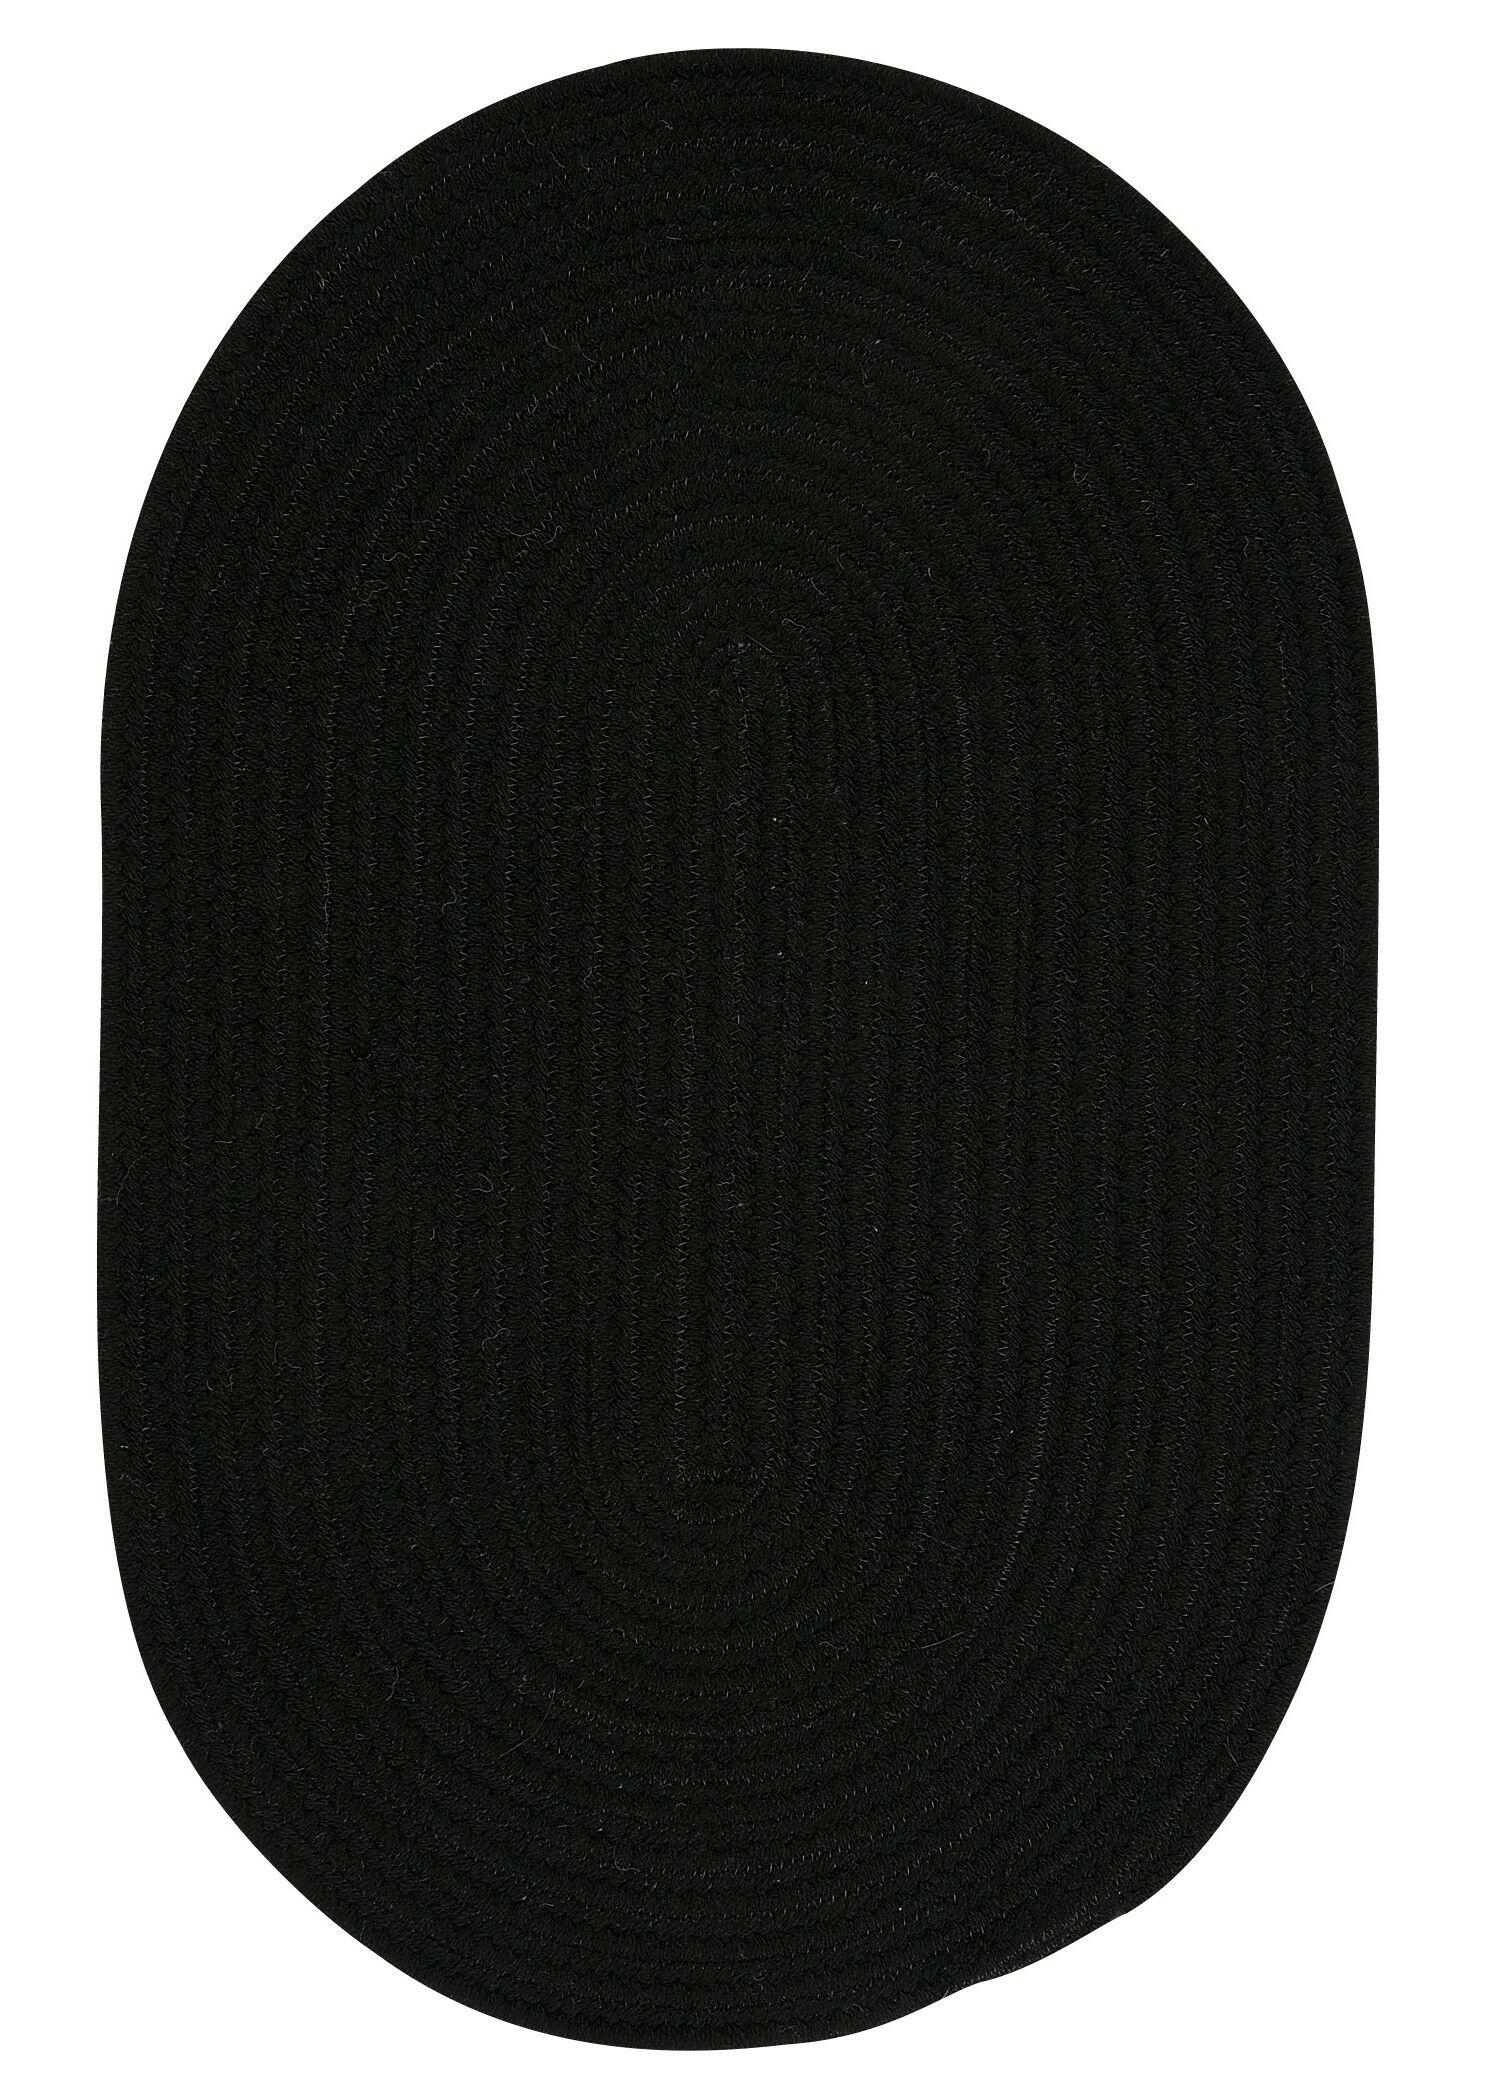 Navarrette Black Area Rug Rug Size: Oval 2' x 6'